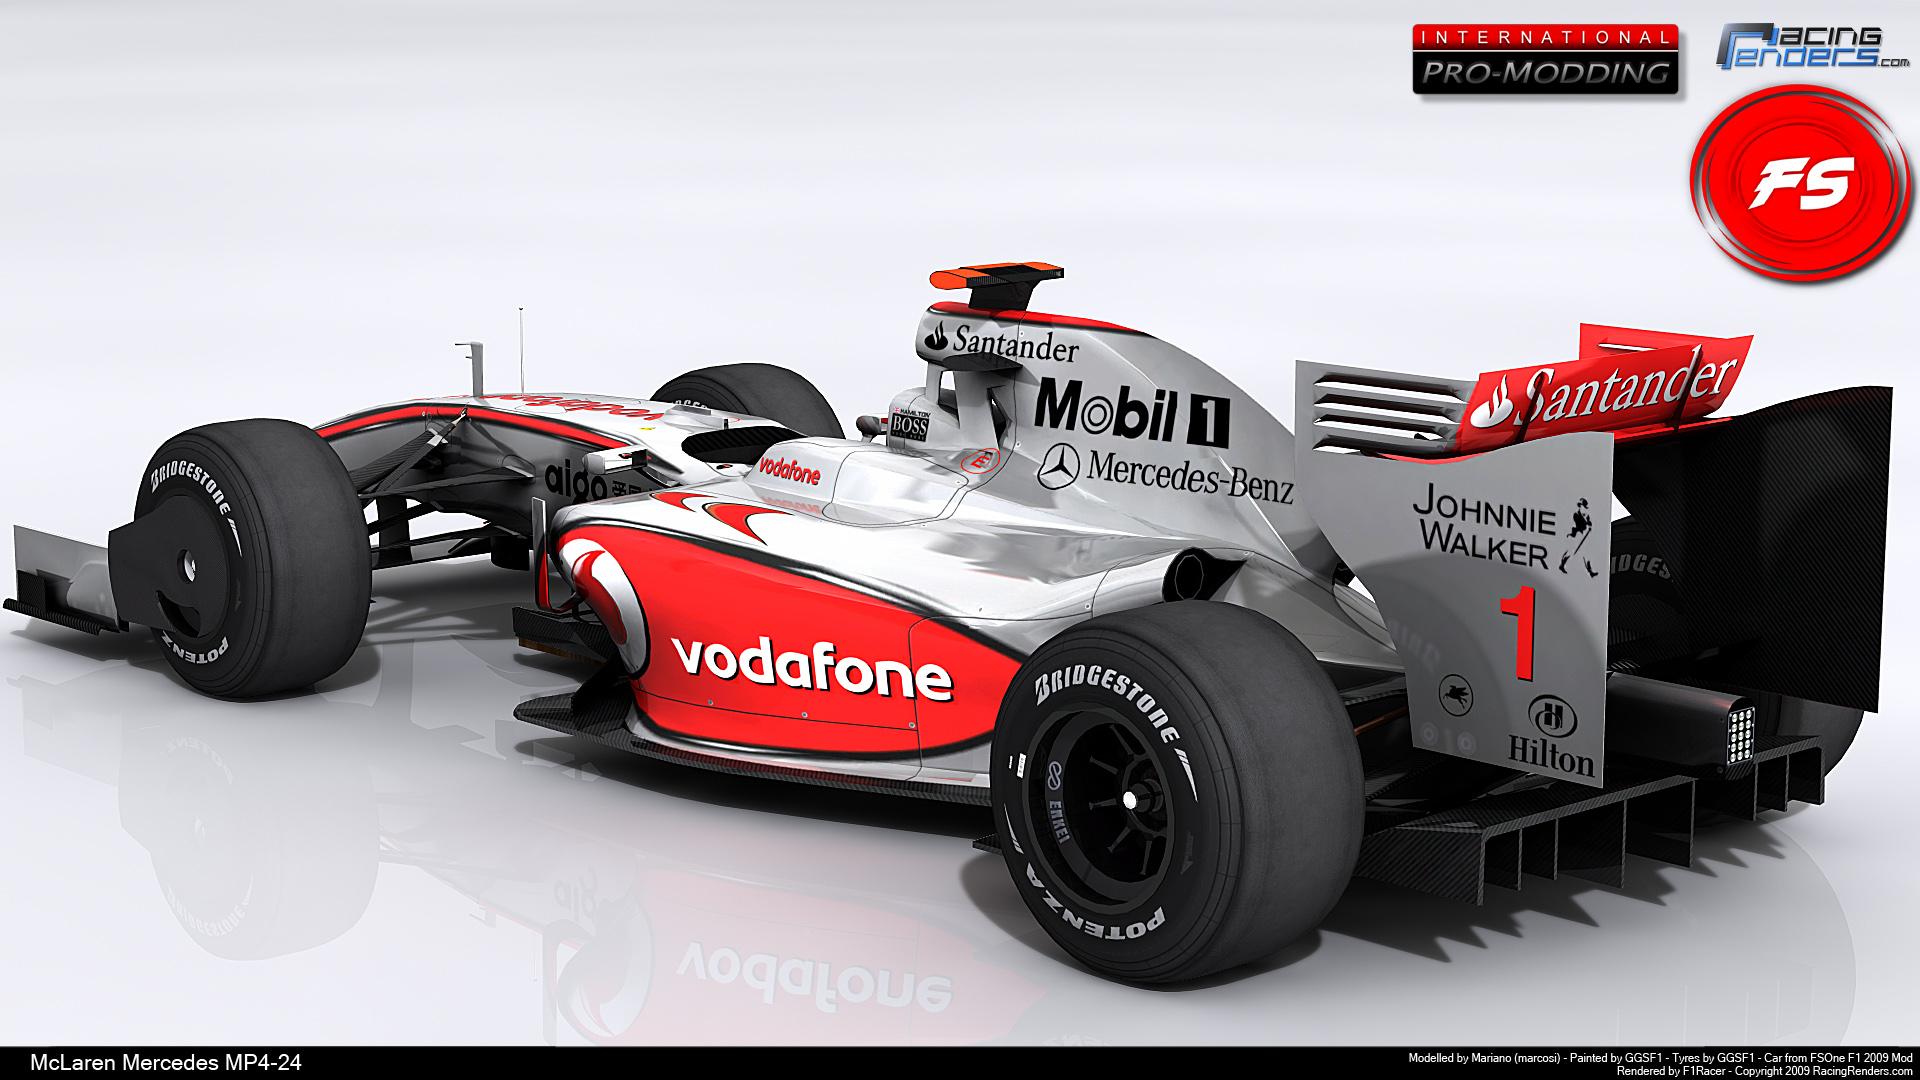 HD Wallpapers Mercedes Mclaren F1 Race Car